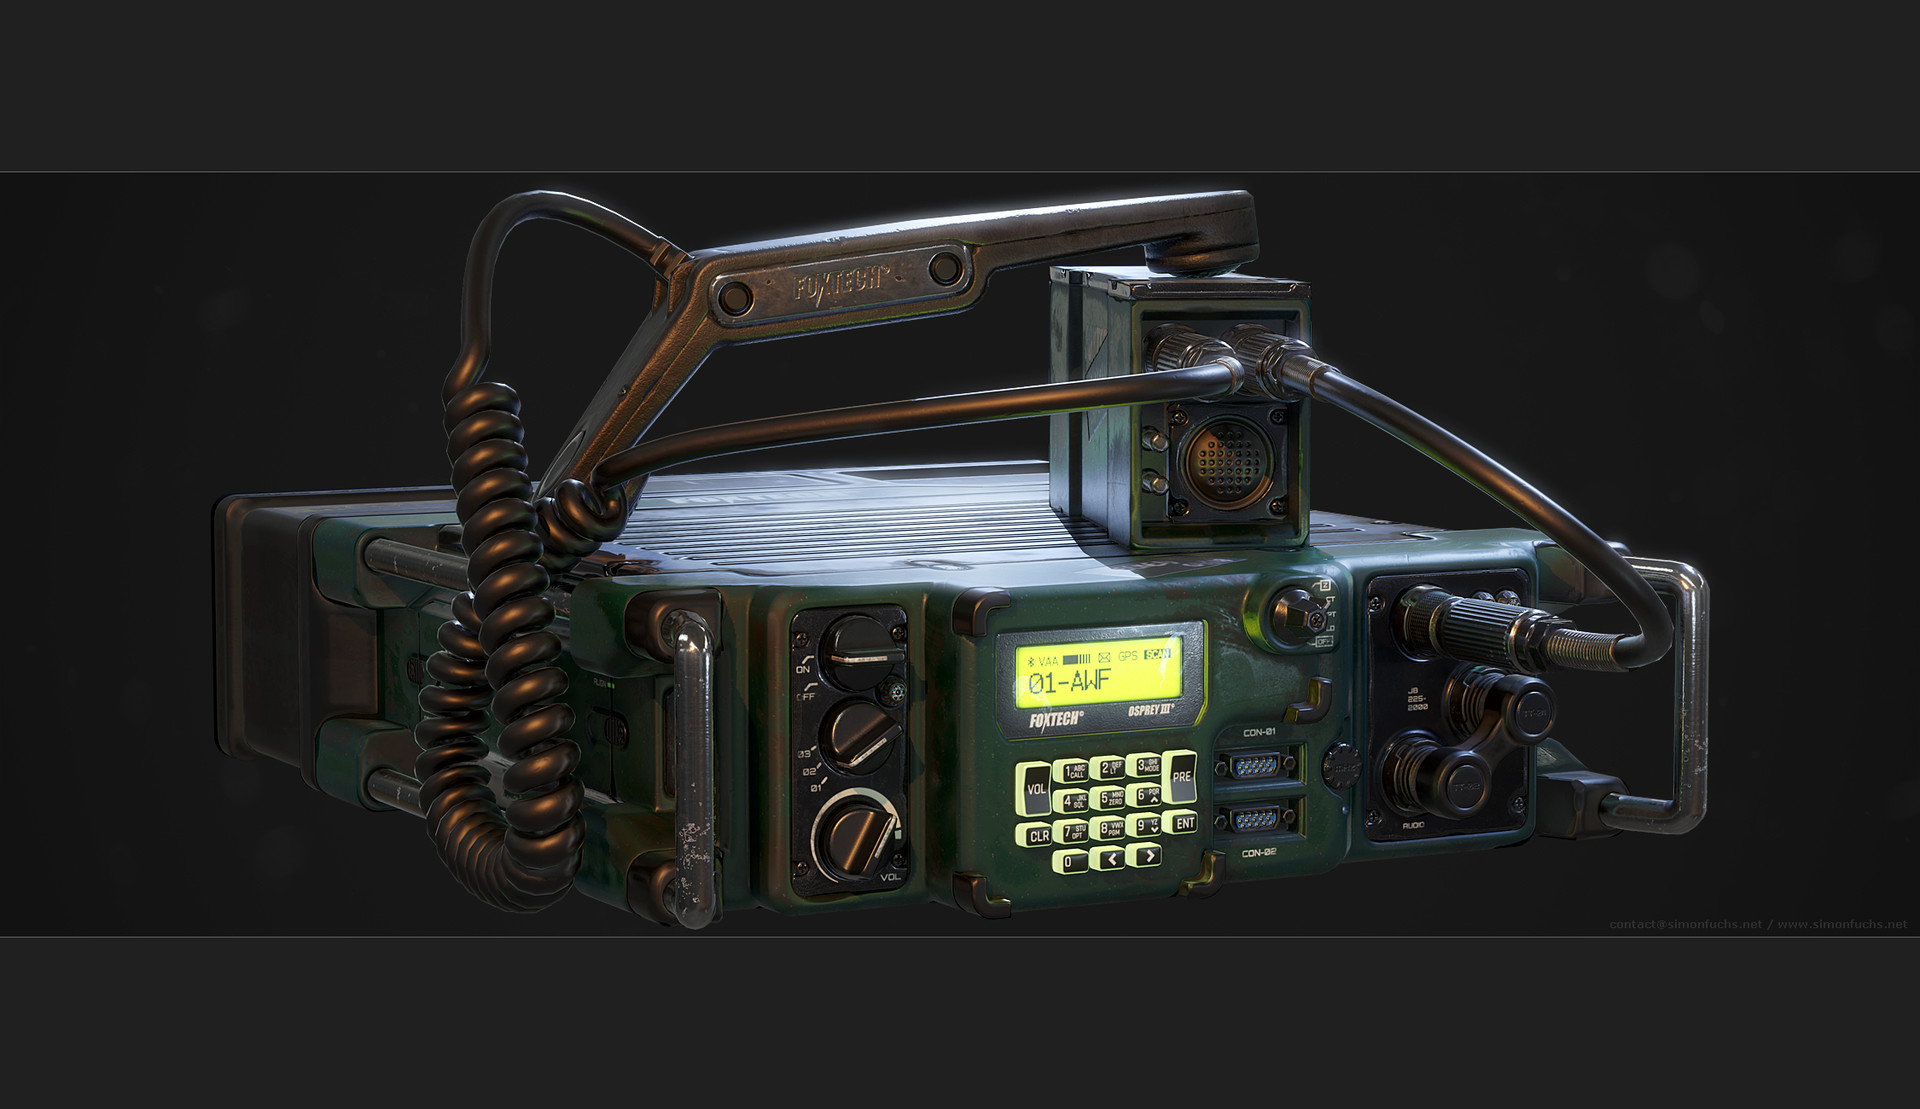 ArtStation - Military Radio Tutorial, Simon Fuchs